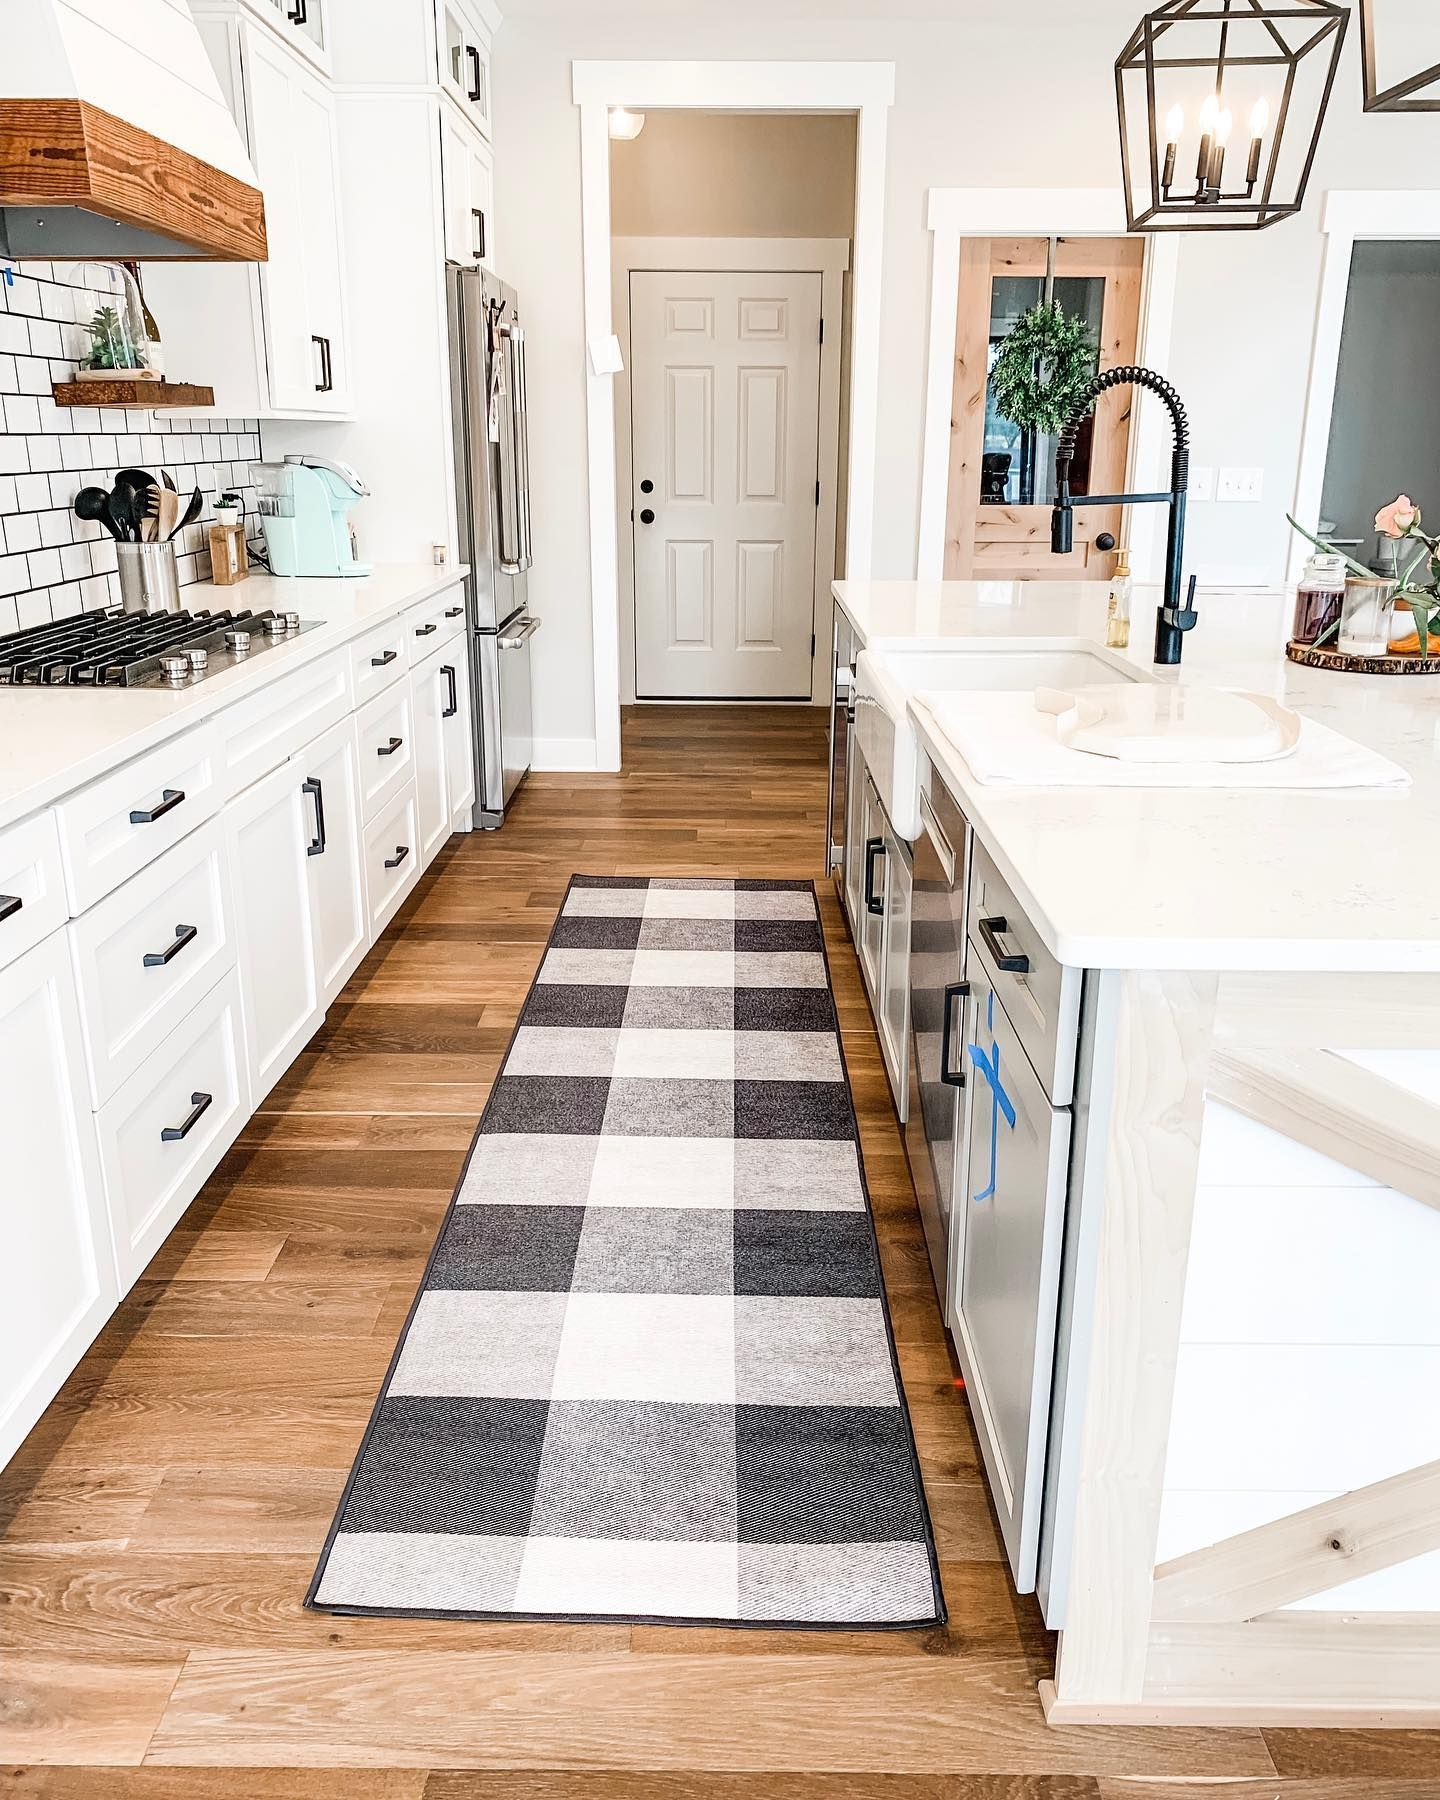 Linear Aztec Black Rug In 2020 White Kitchen Decor White Farmhouse Kitchens Black White Rug